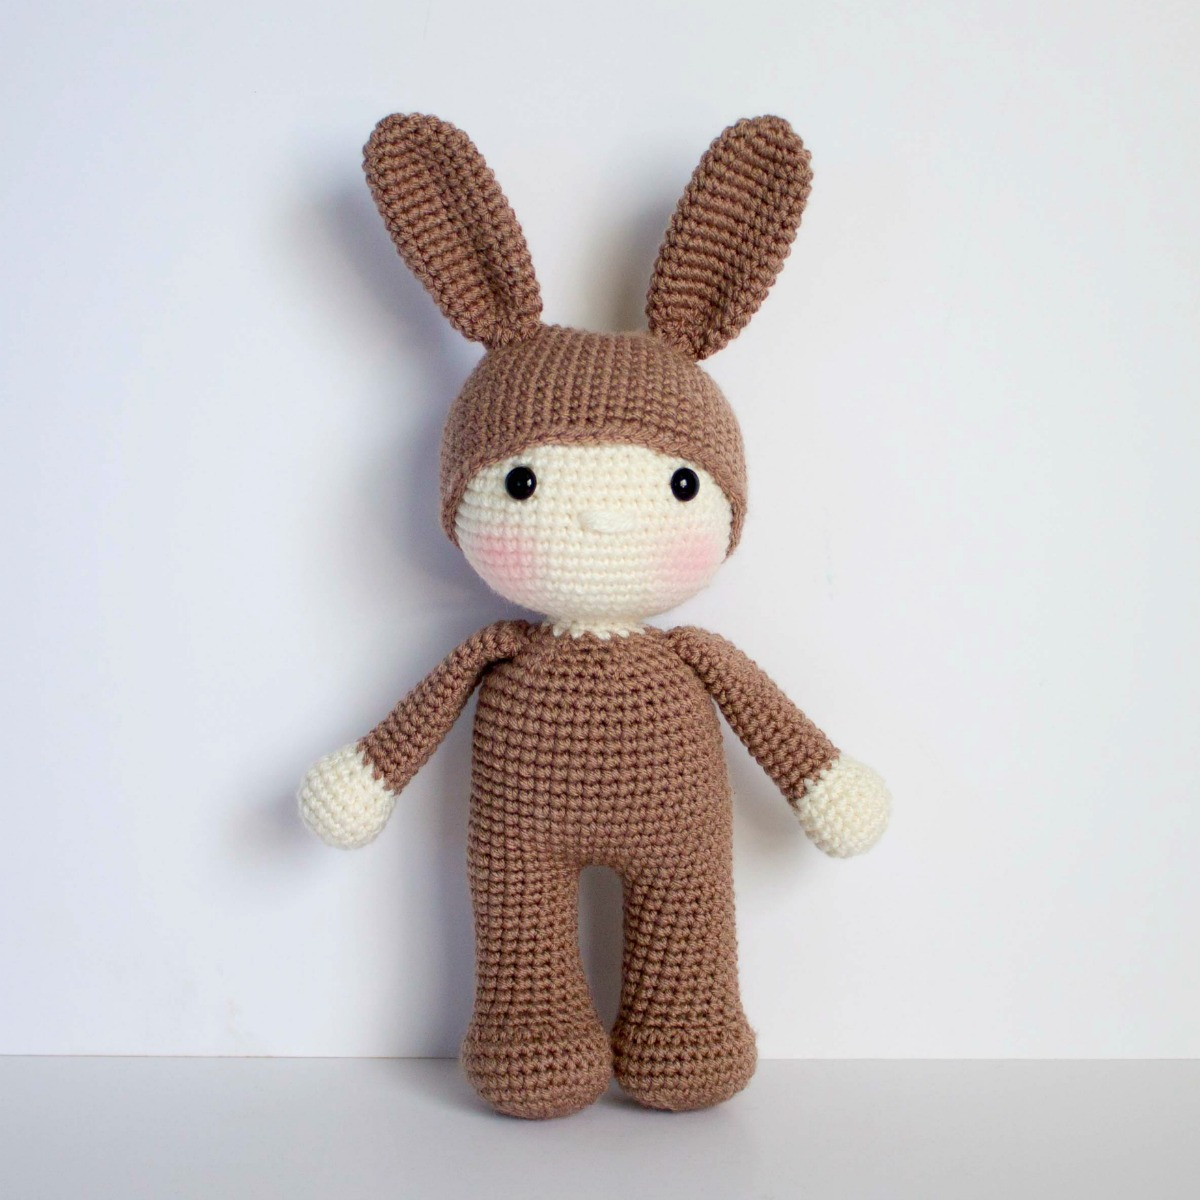 Forest Friends Amigurumi Crochet Pattern - Sayjai Amigurumi ... | 1200x1200